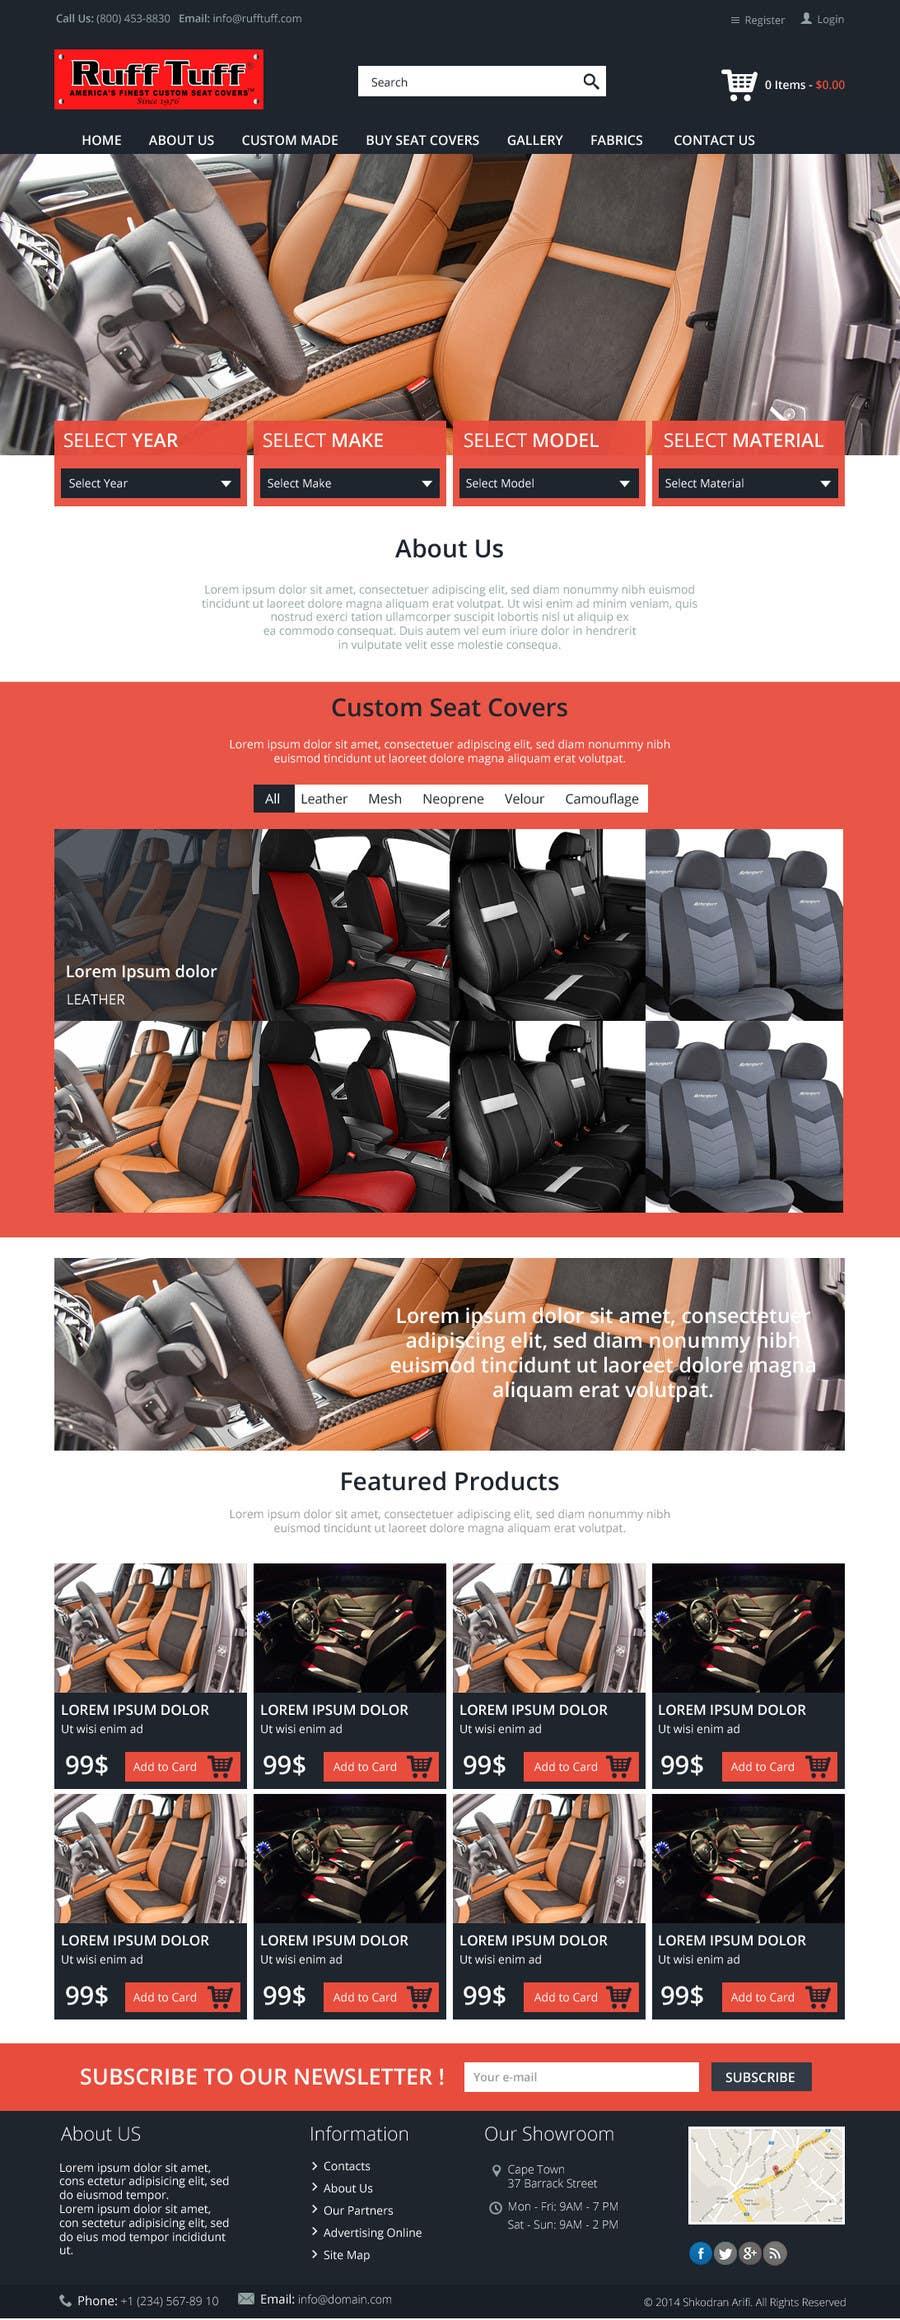 Penyertaan Peraduan #                                        17                                      untuk                                         Design a Website Mockup for an auto seat cover manufacturer